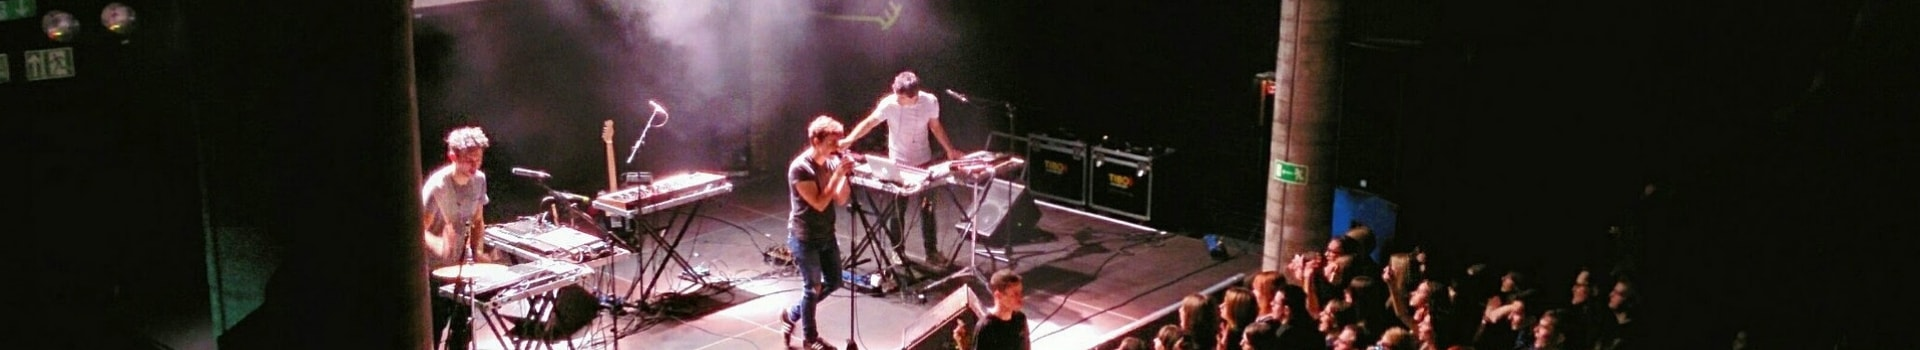 Directorio de música emergente de Galicia